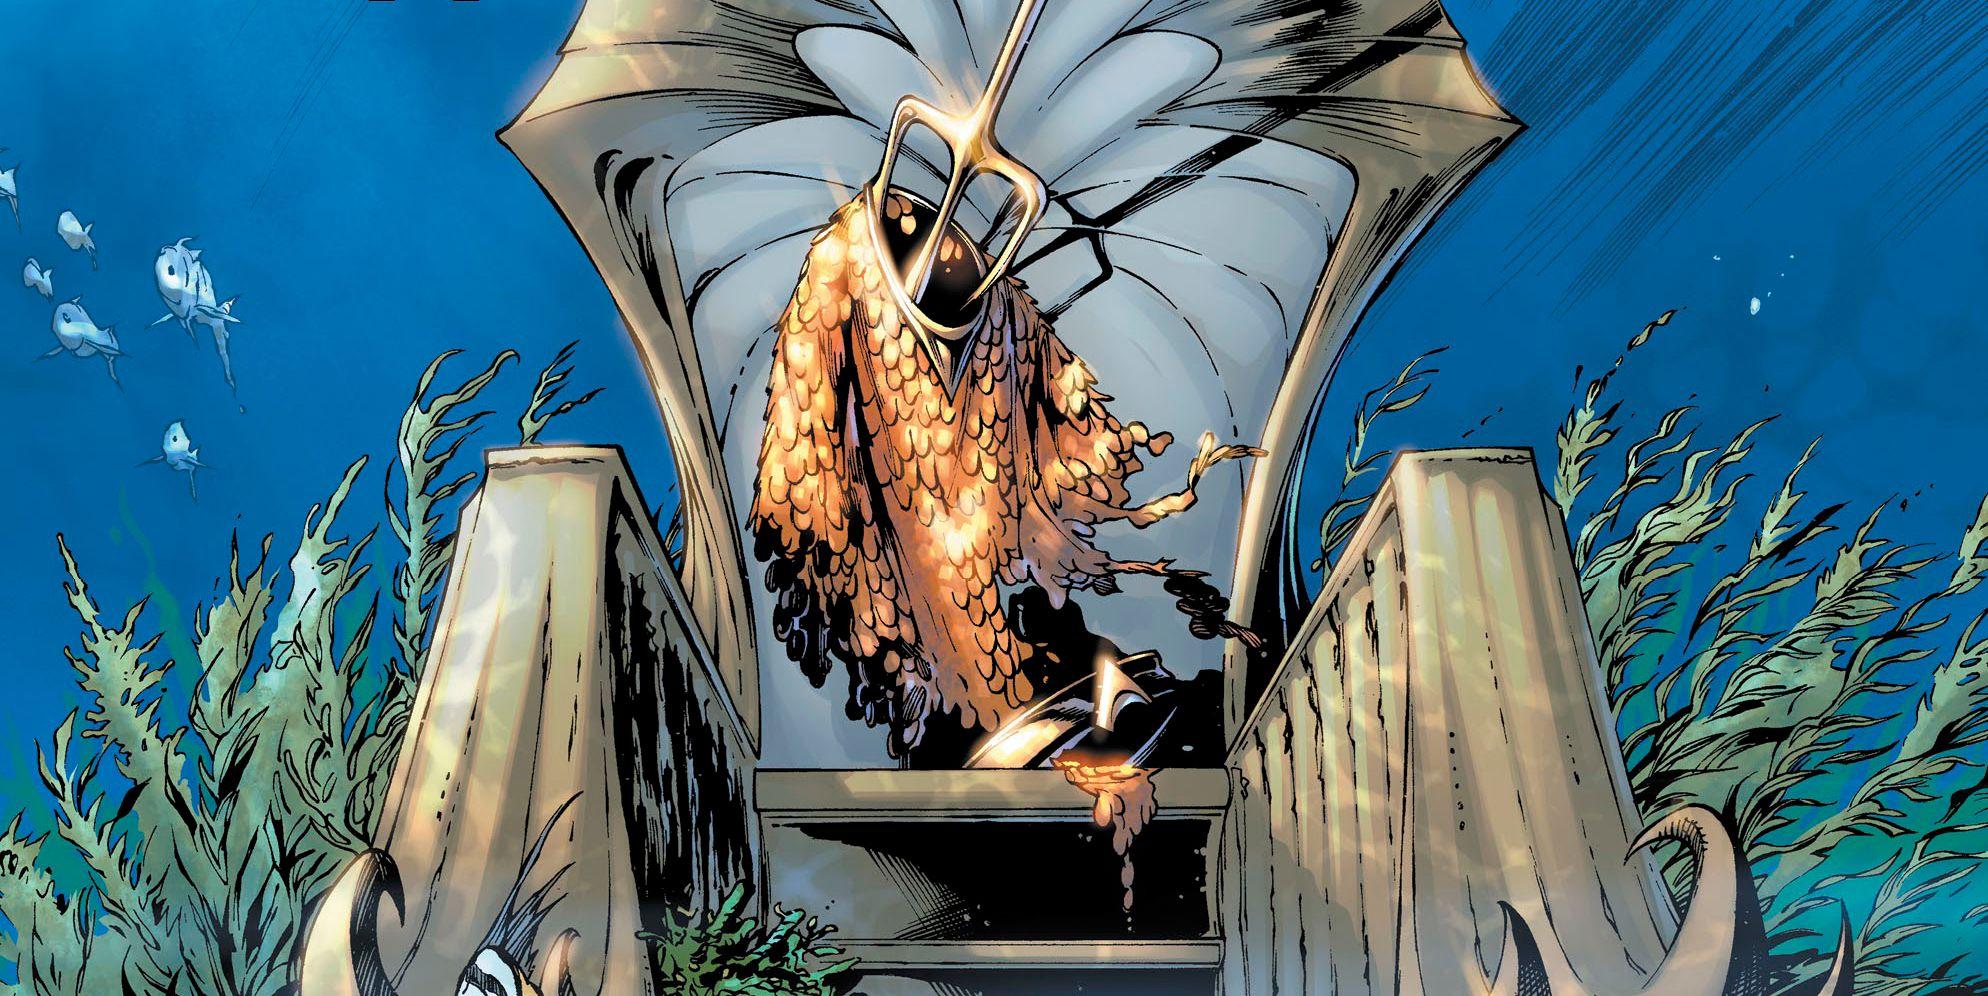 Aquaman Just Got His Own Bruce Banner - and a Kaiju Hulk | CBR